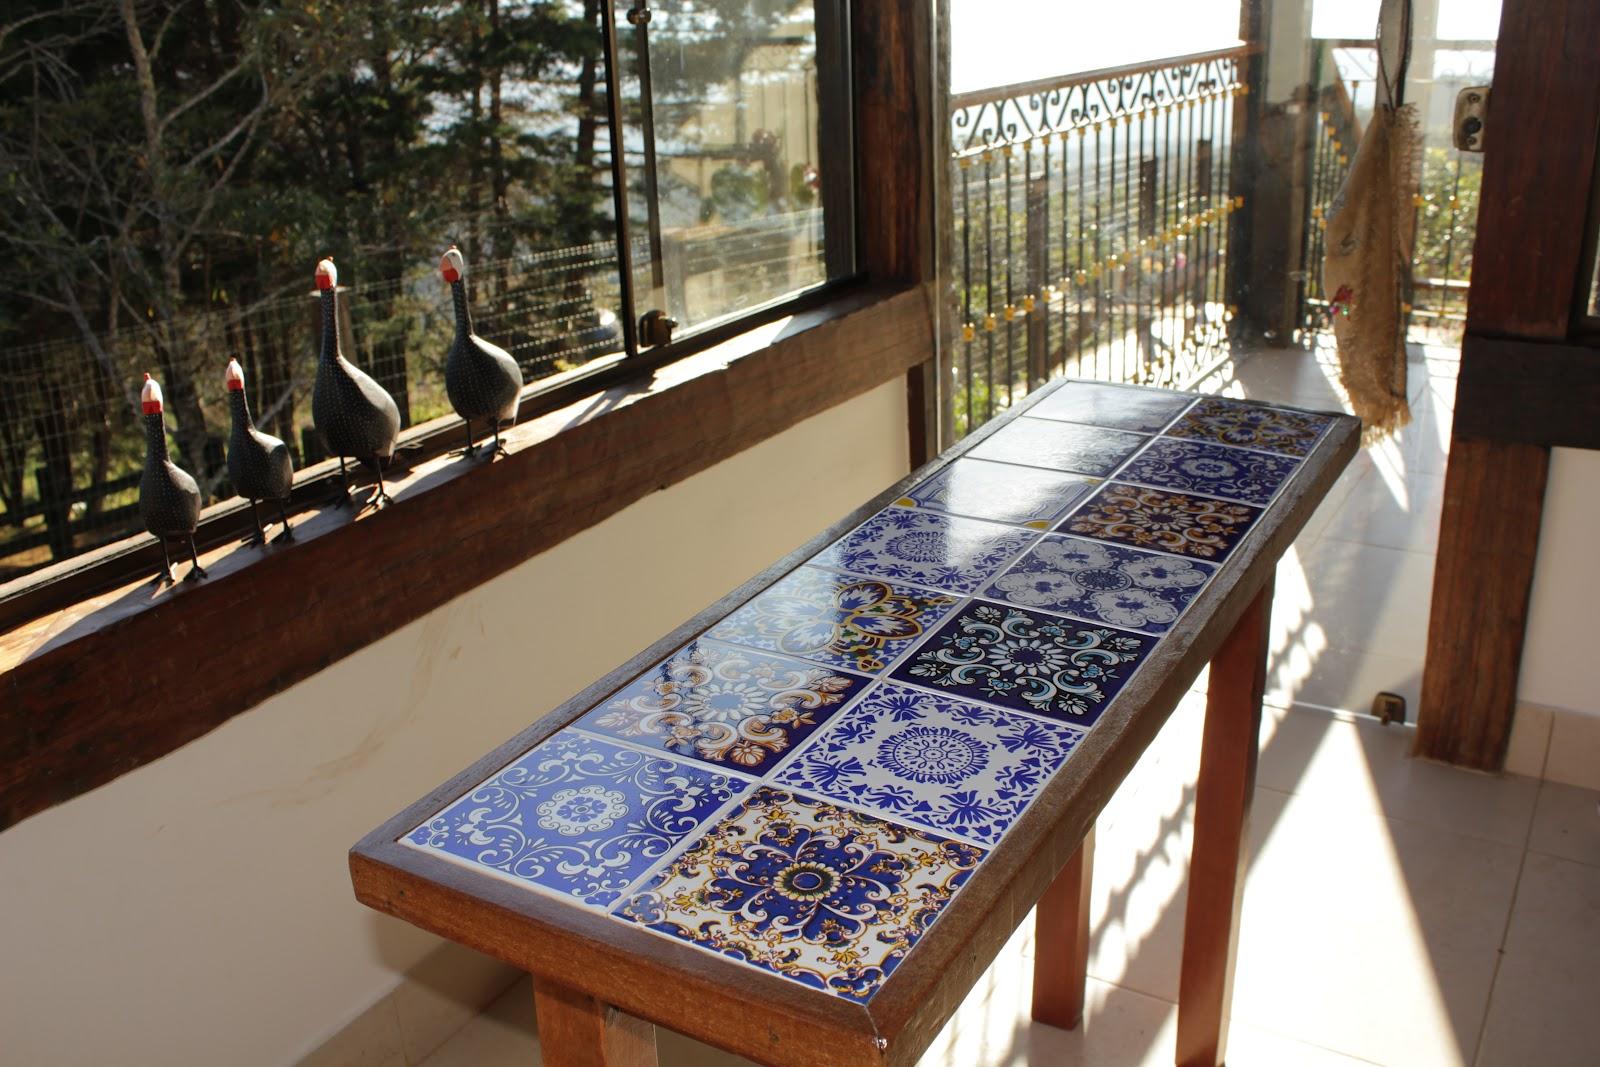 Balellas mesa em azulejos antigos - Mesas de azulejos ...